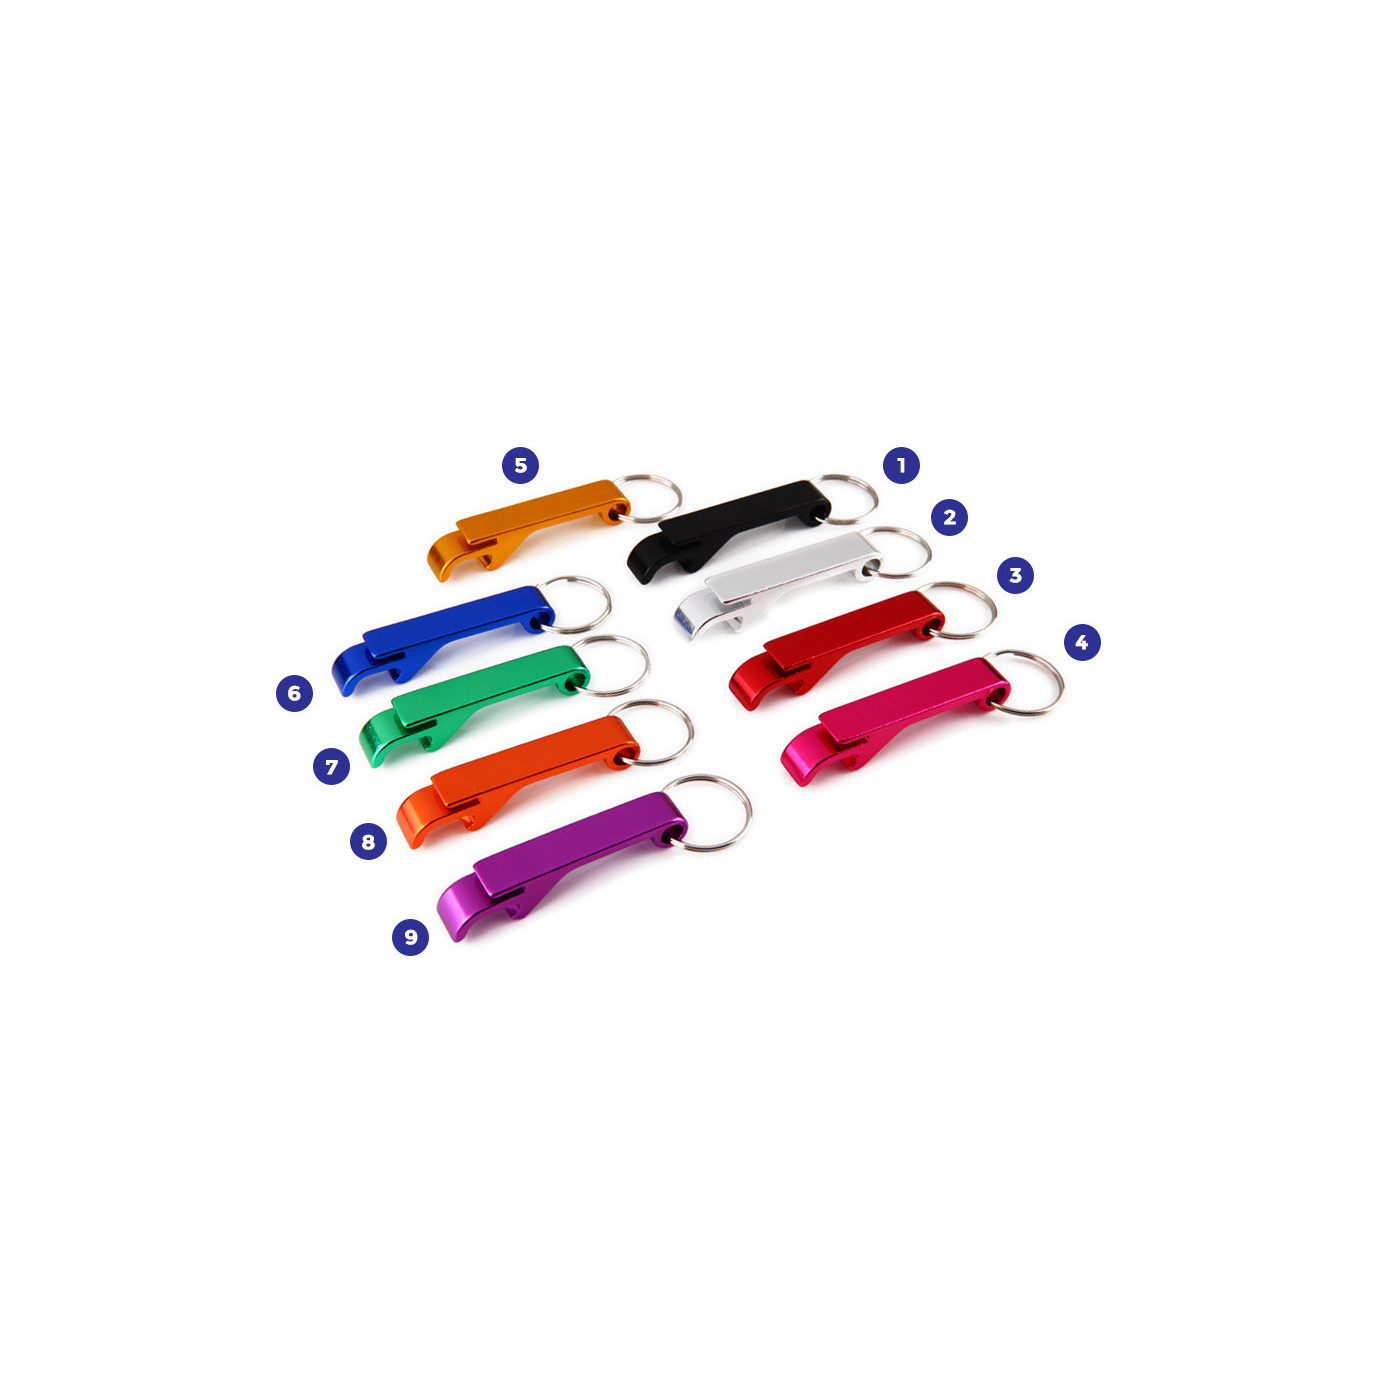 Set of 10 metal bottle openers, color 5: light orange